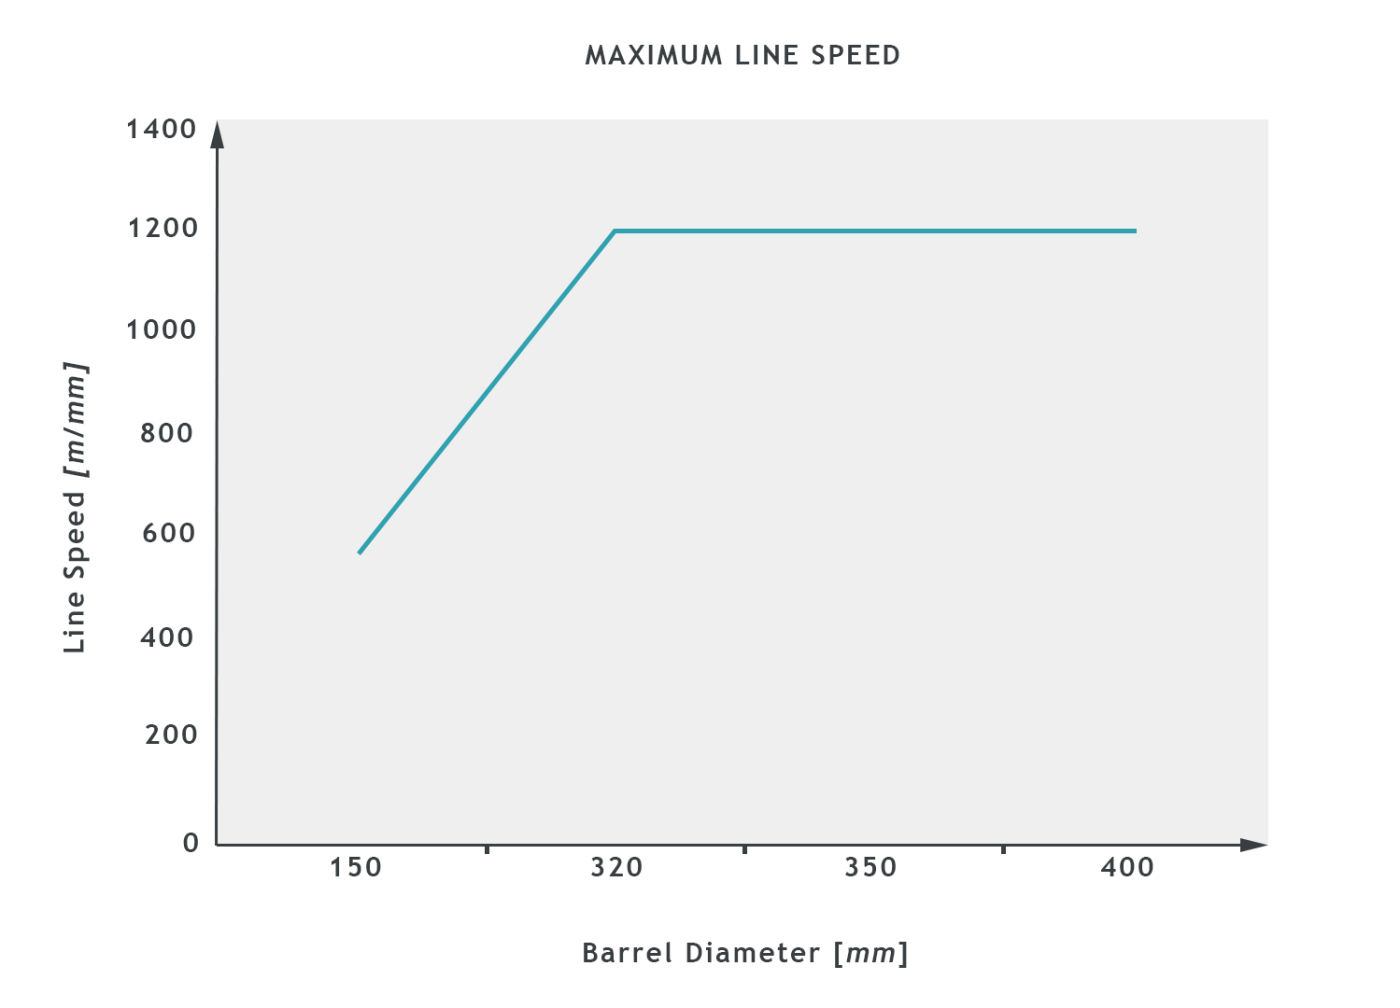 EKP8_SB0422130_MaxLineSpeed_graph1.jpg